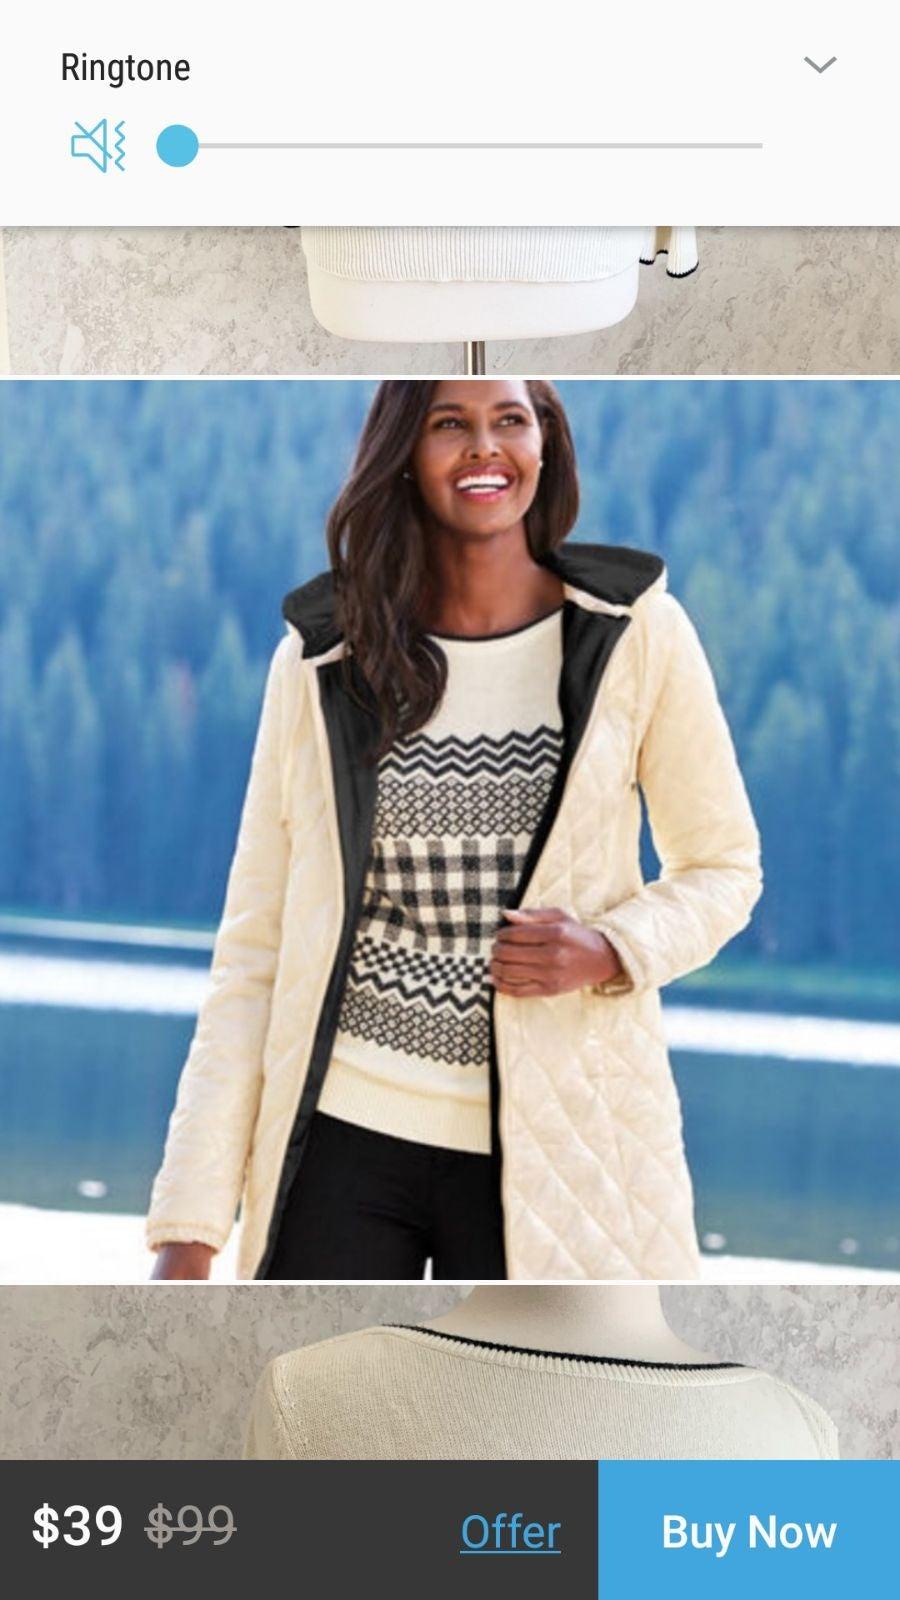 NWOT Talbots Ivory & Blk Chevron Sweater